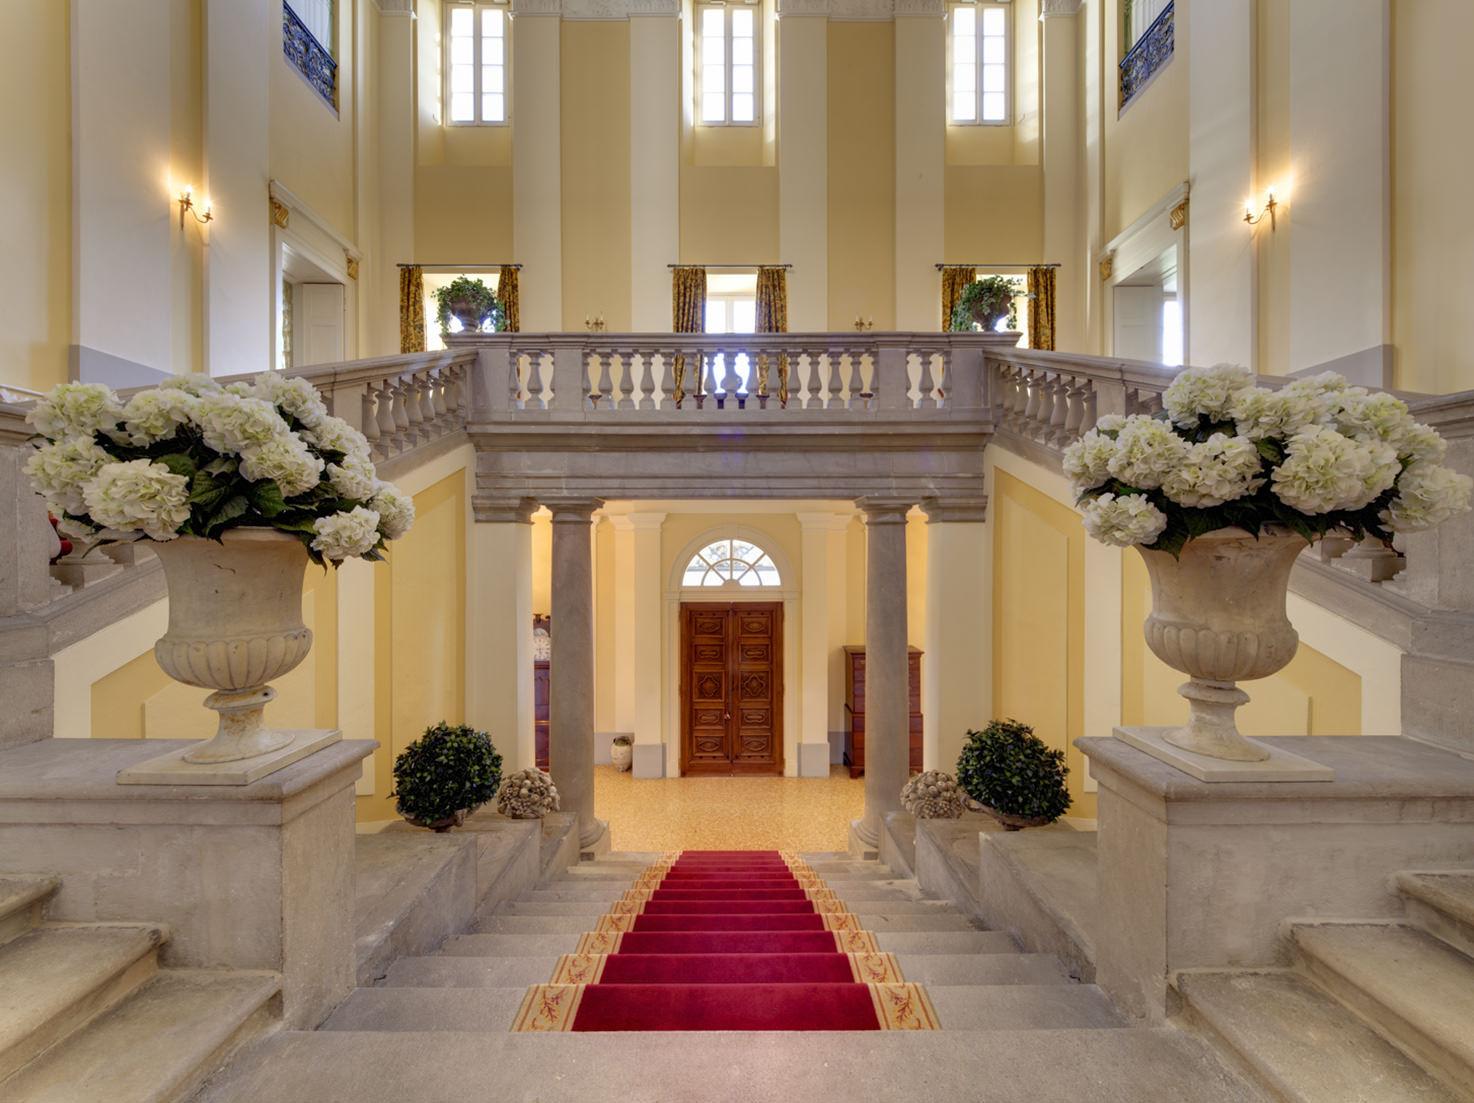 Entrance of Villa Passalacqua